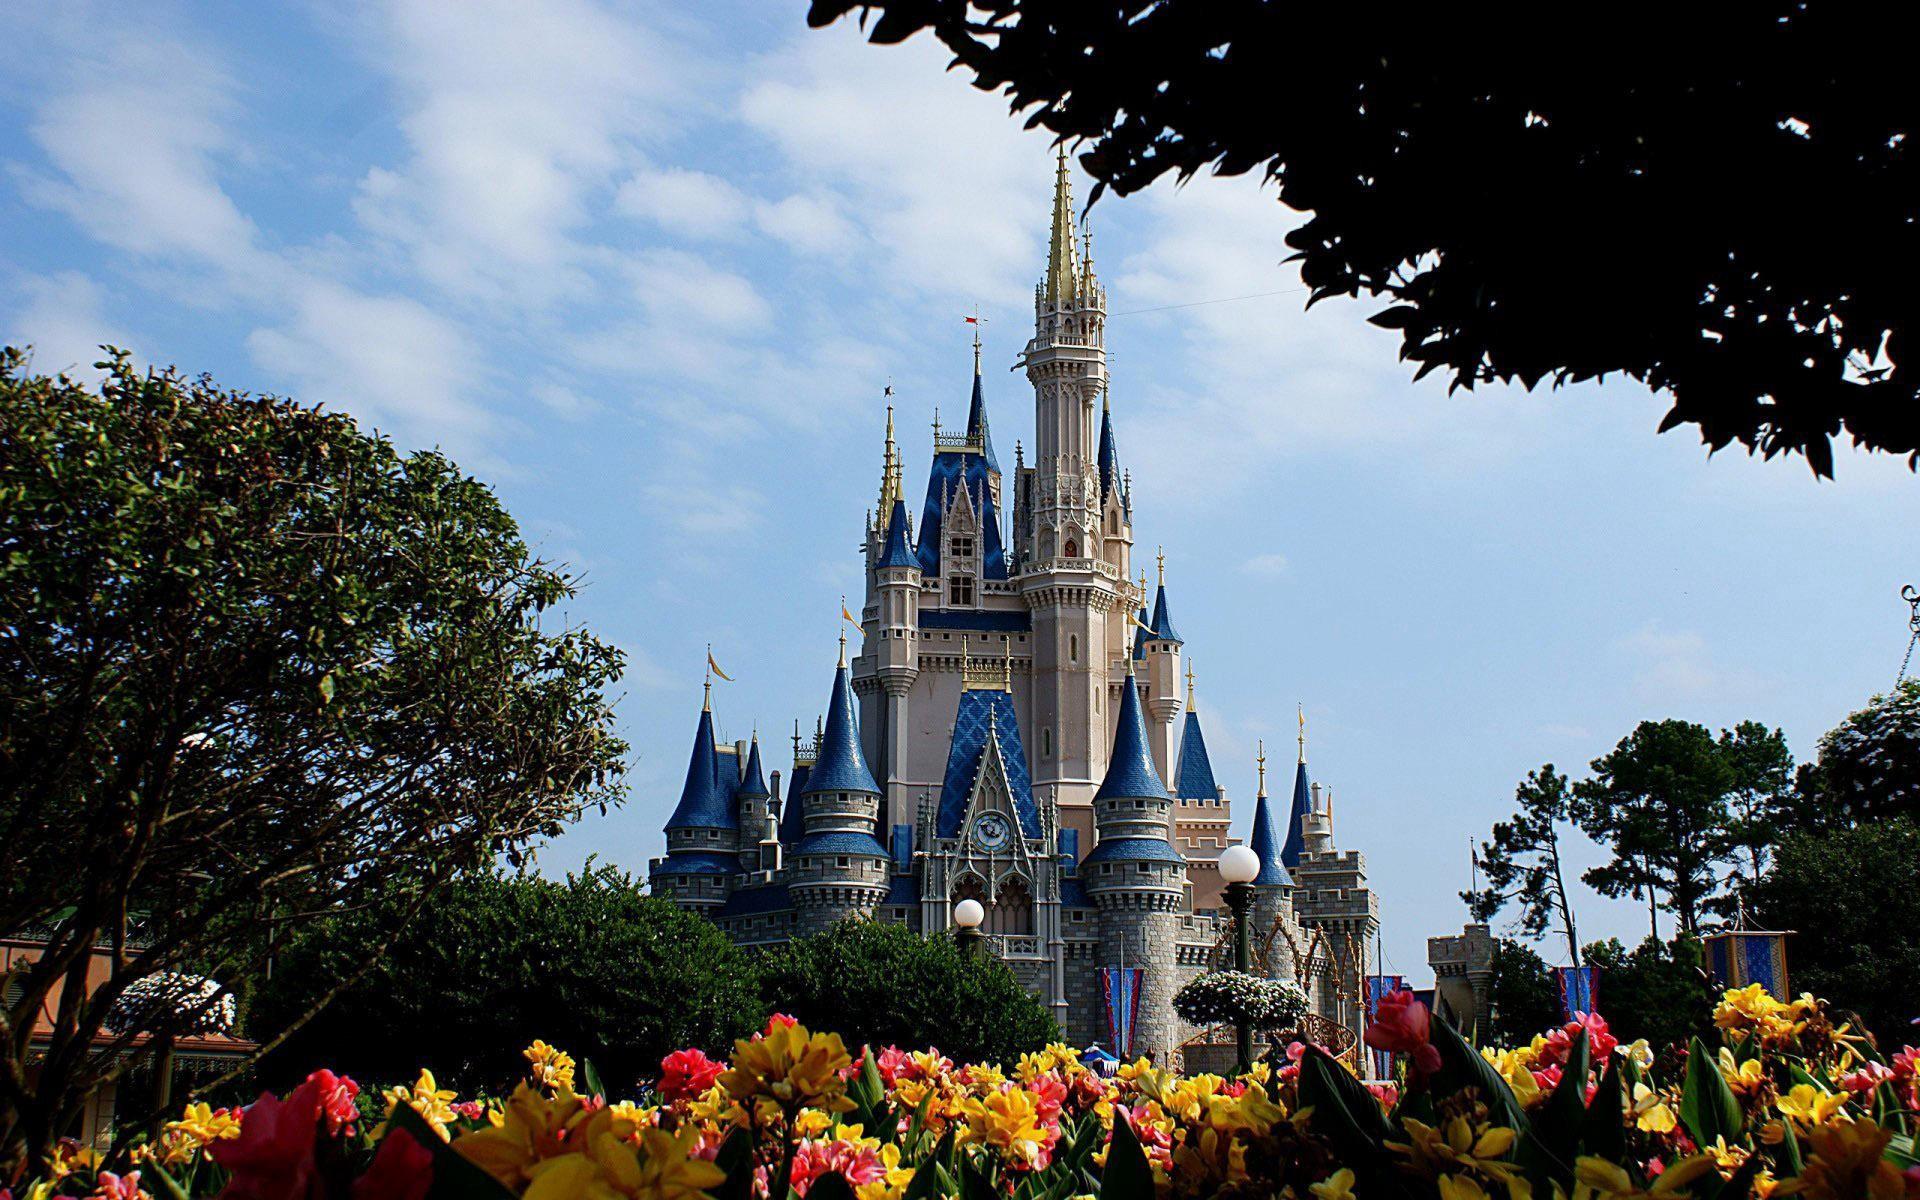 wallpaper.wiki-Disneyland-disney-castle-tree-sky-PIC-